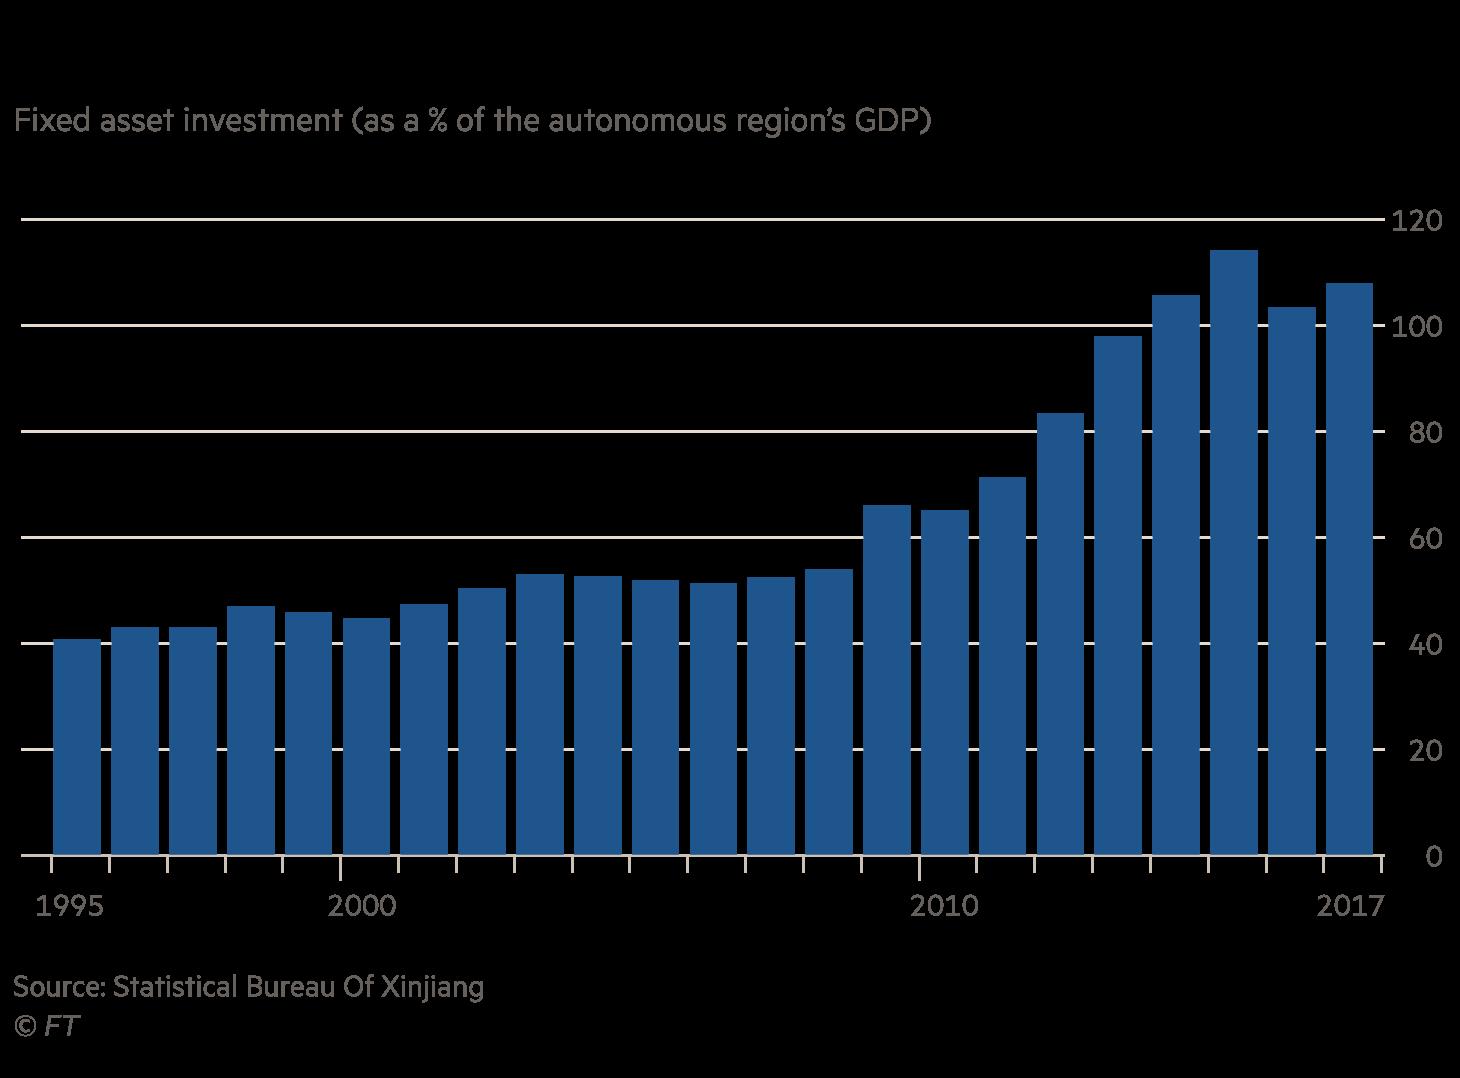 Xinjiang fixed asset investment